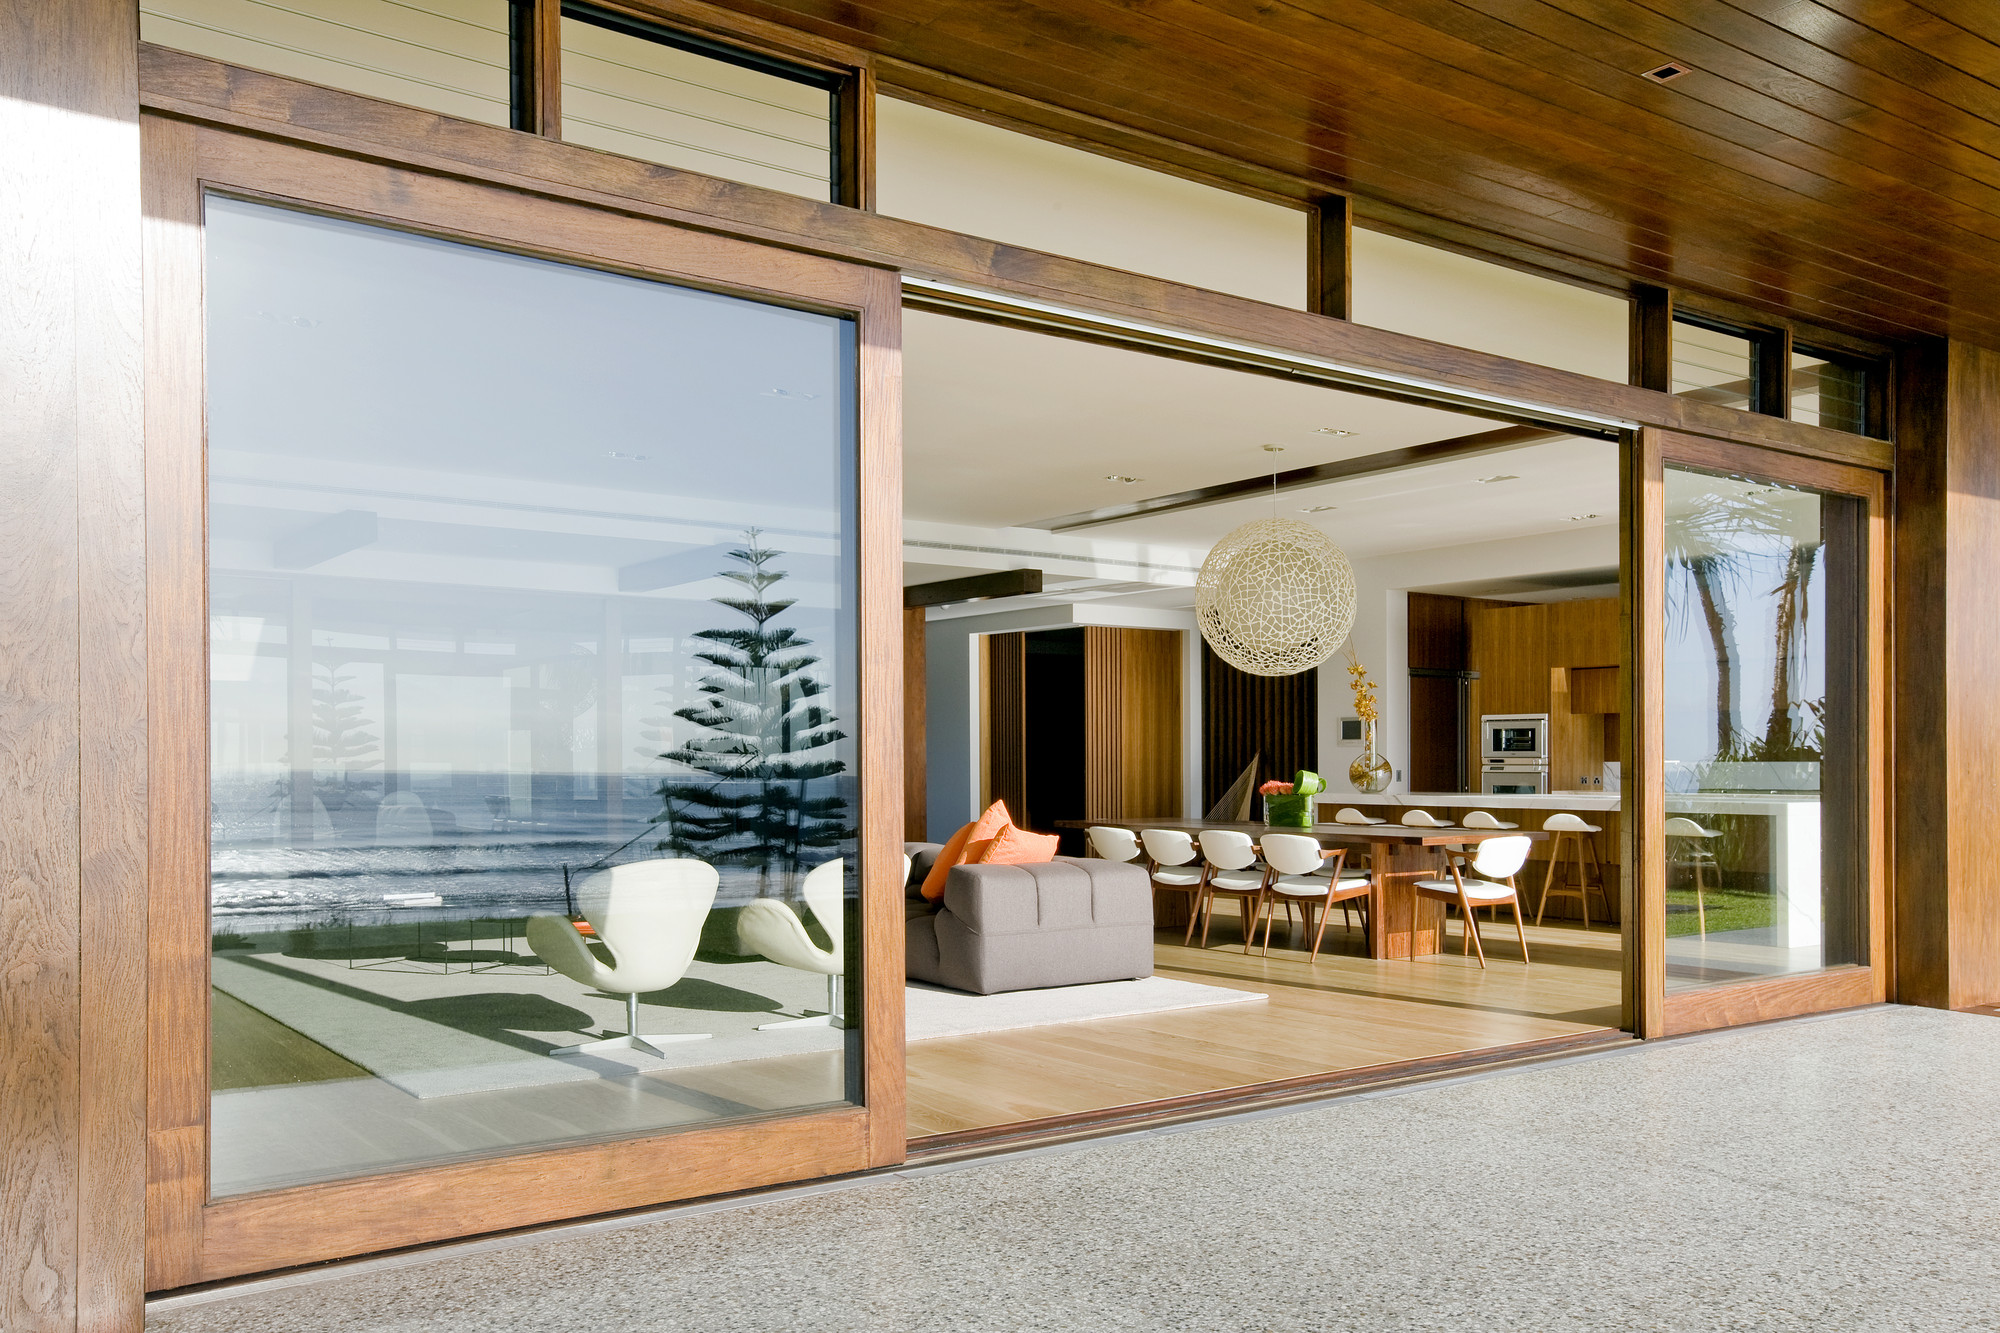 Patio Pet Door at Home and Interior Design Ideas